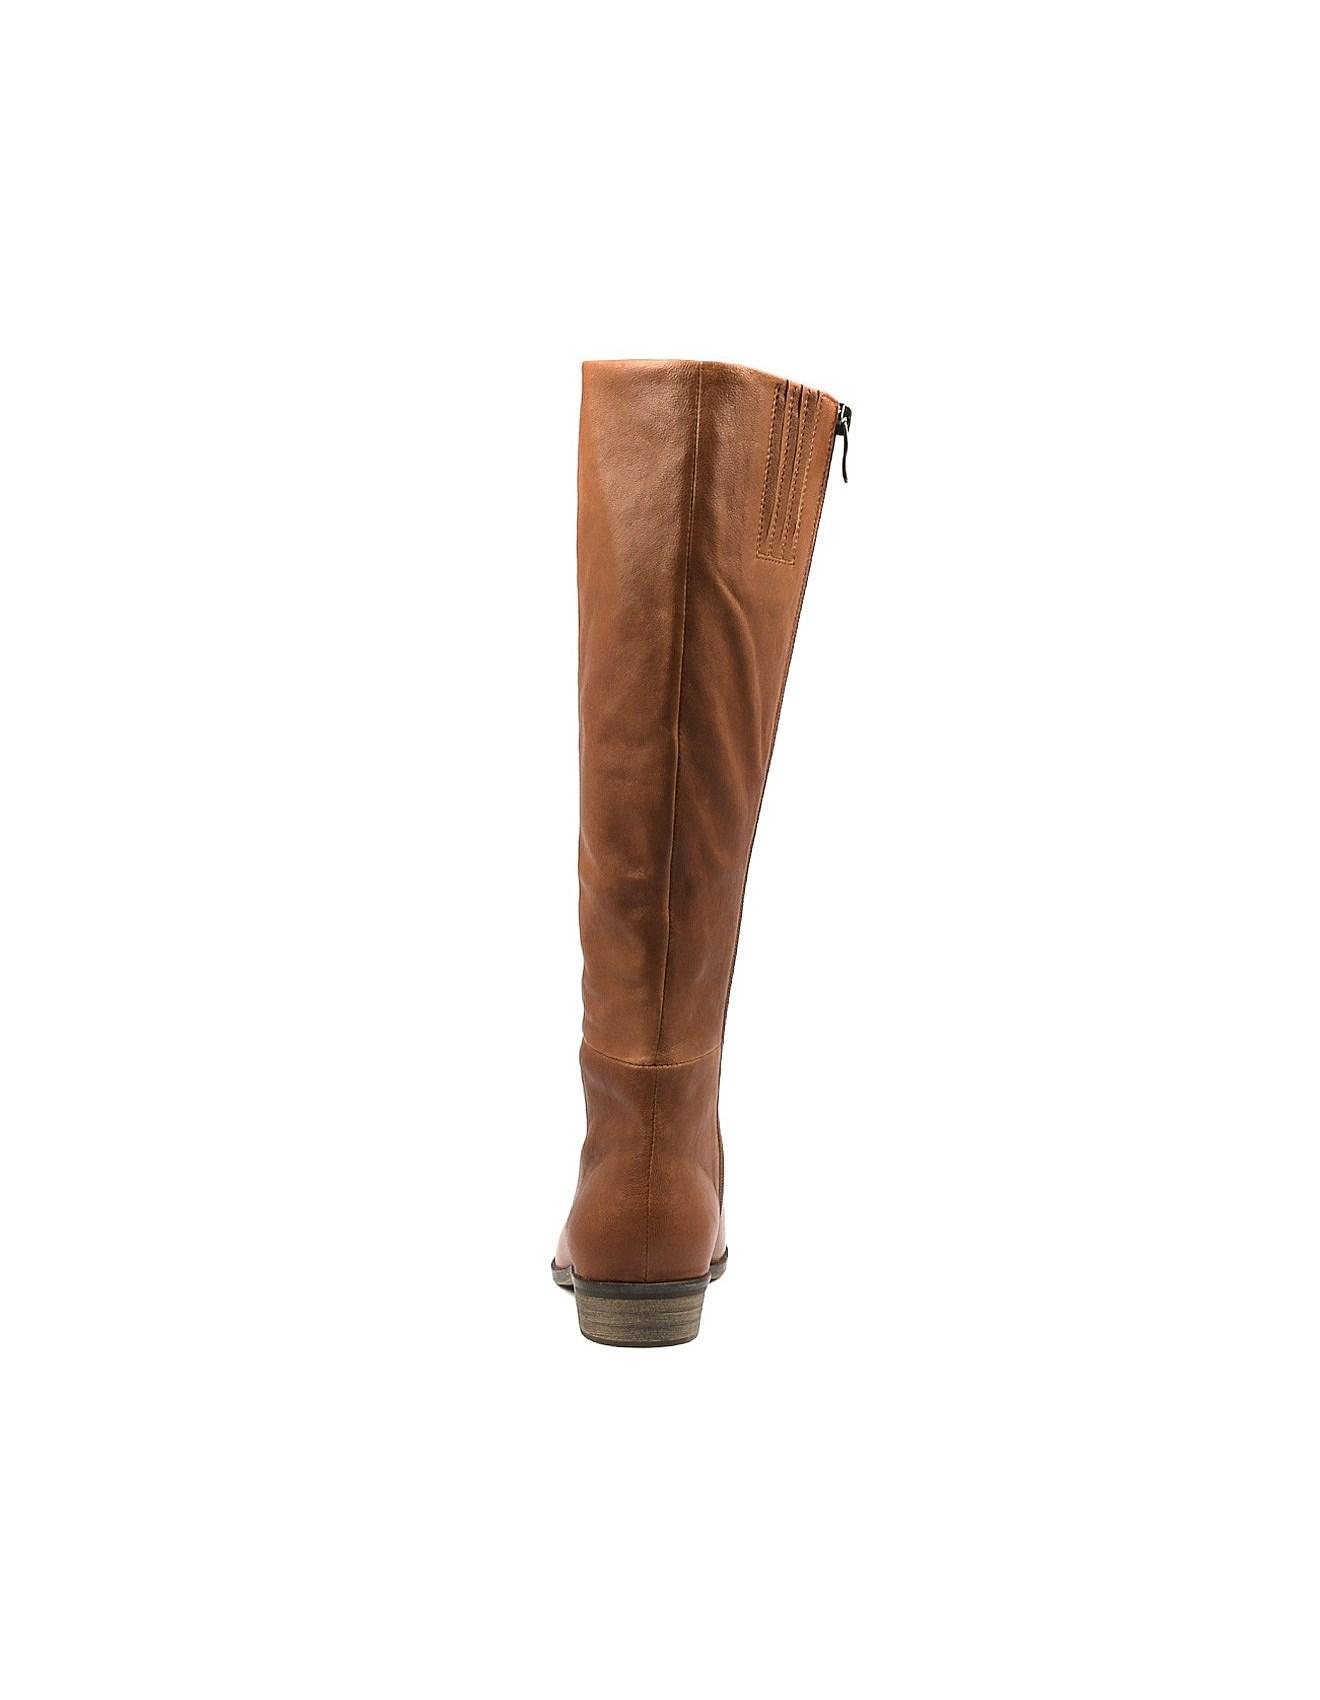 75028b084fcc Home · Knee High Boots; STARLING DK TAN LEATHER. STARLING DK TAN LEATHER. 1